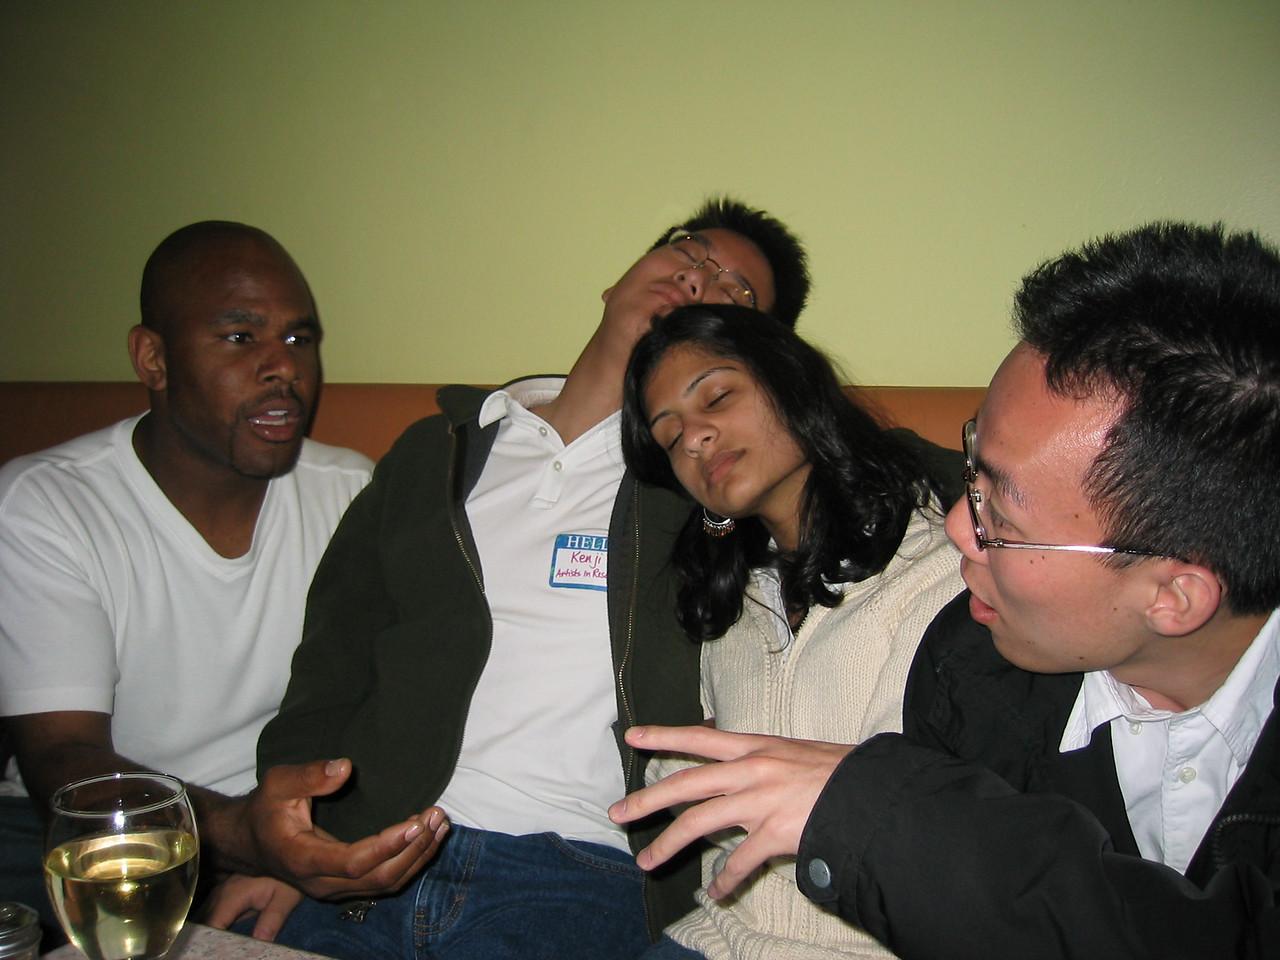 Marc & Albert parted by Kenji & Shaila